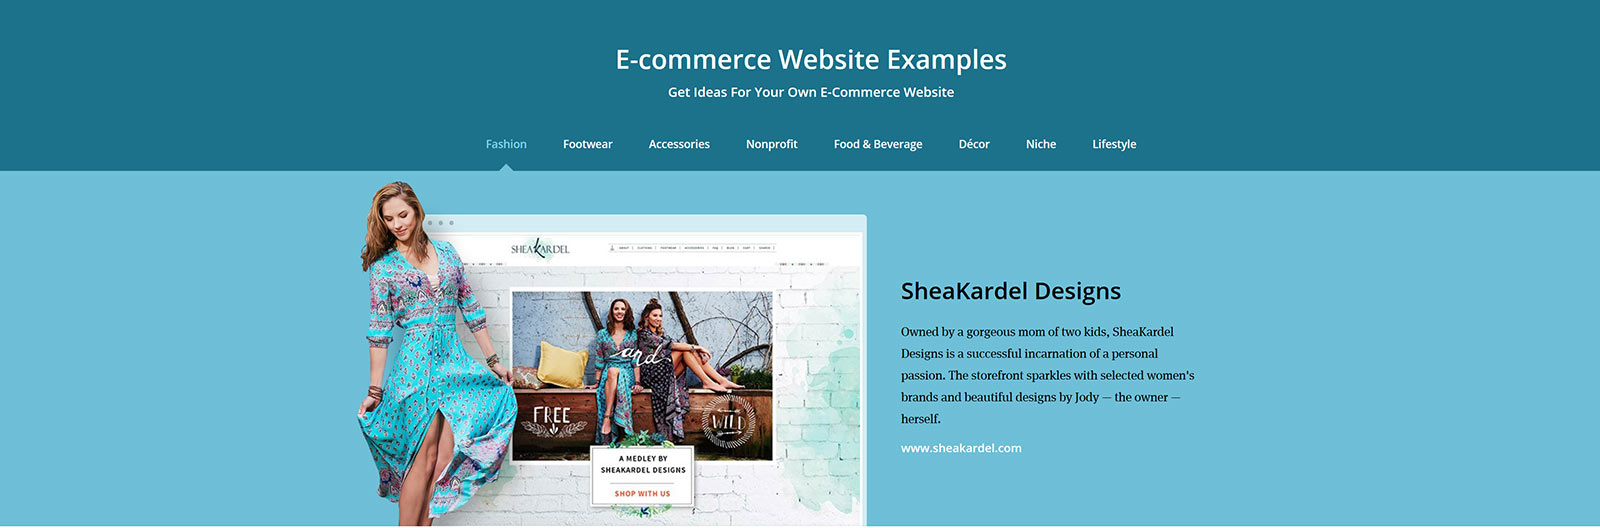 Ecwid features Original Ginger client Sheakardel | Online Shopping Cart Integration